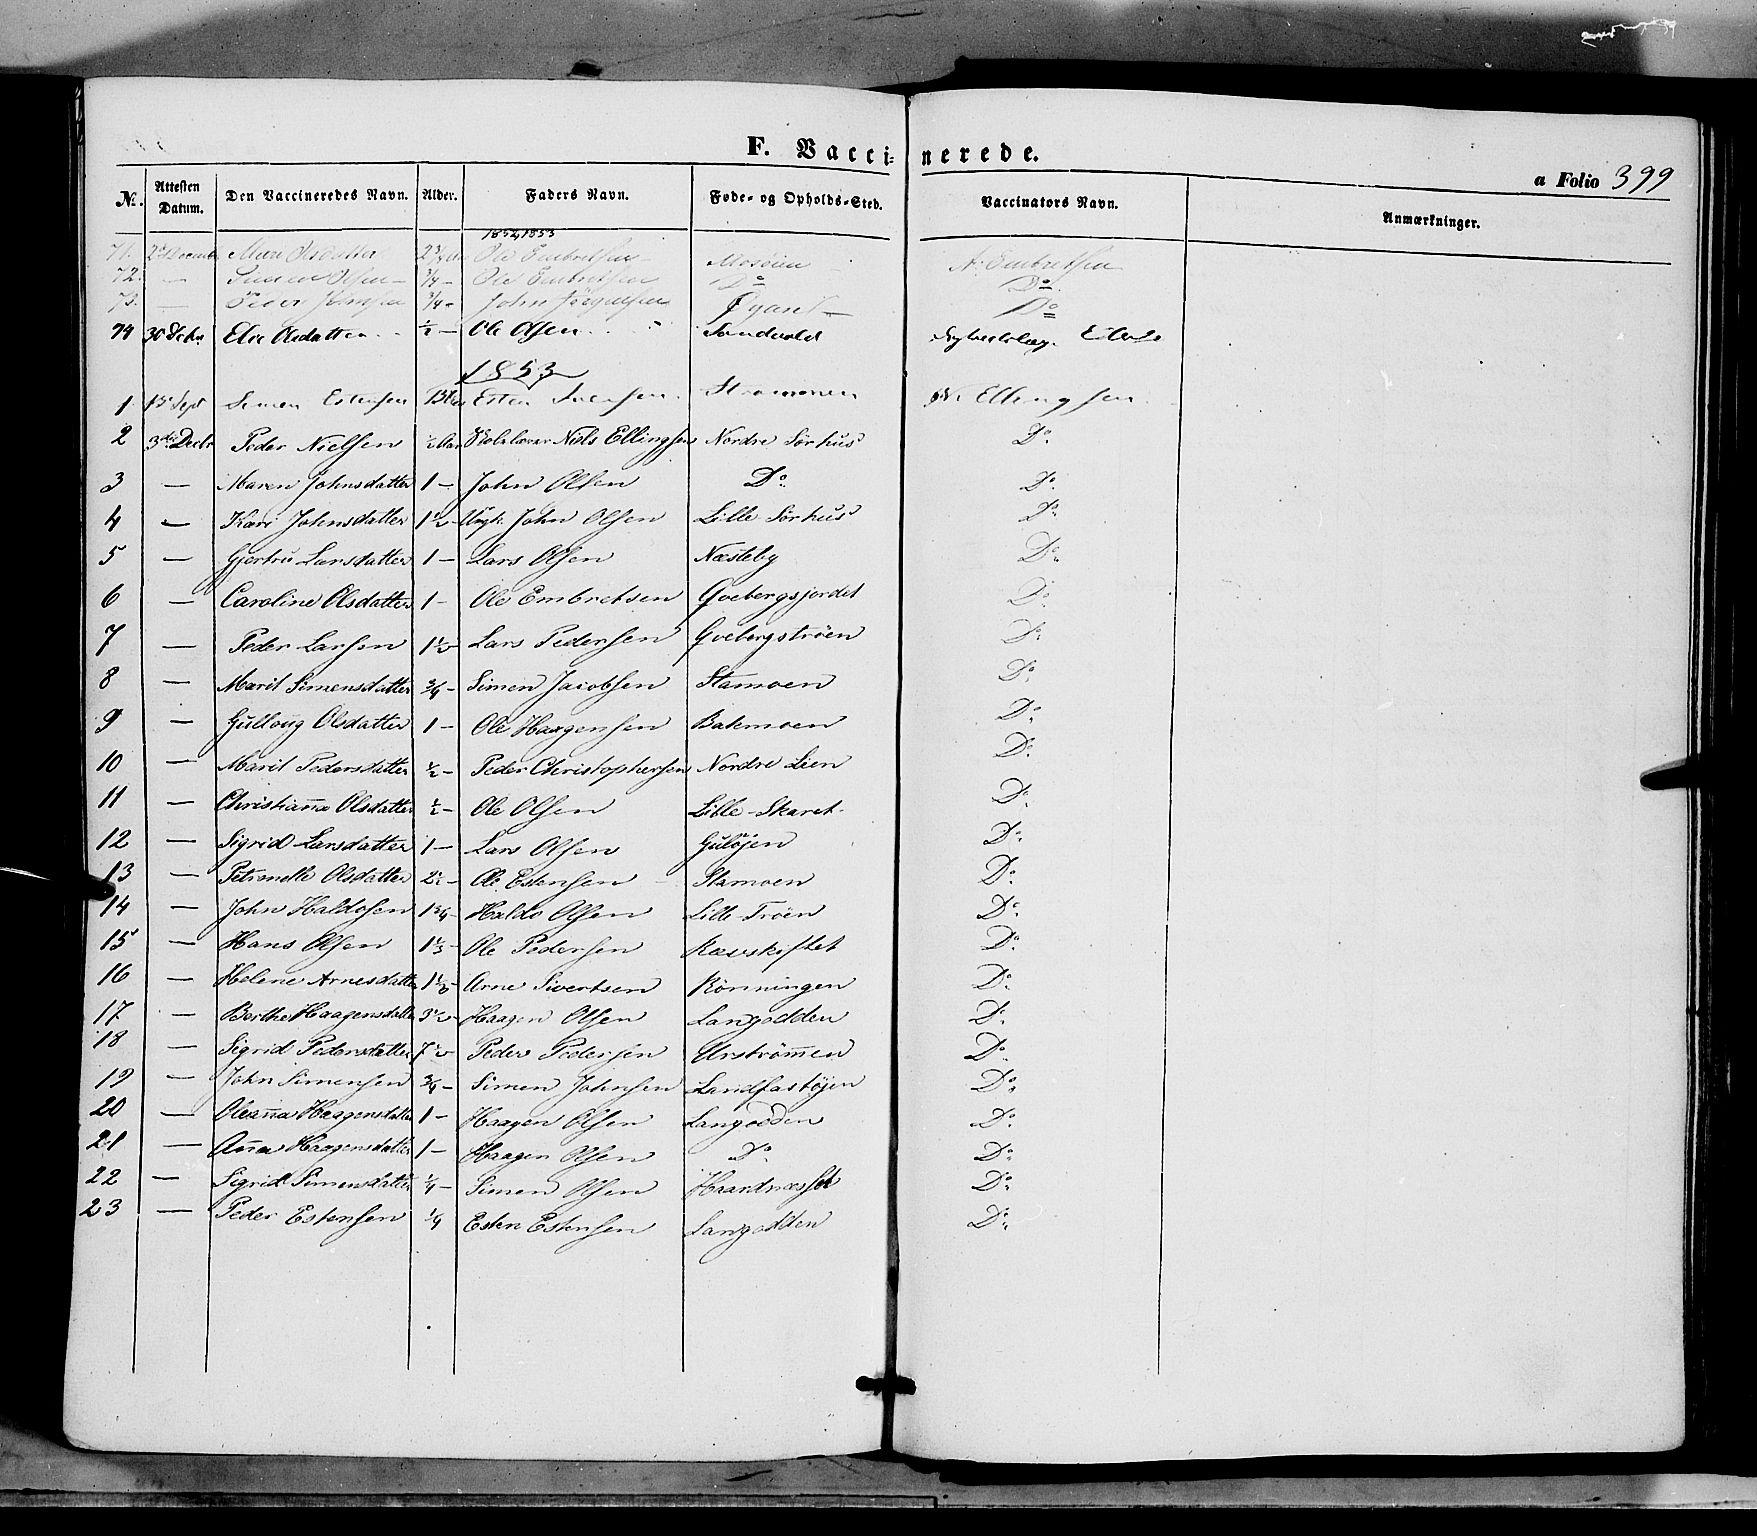 SAH, Tynset prestekontor, Ministerialbok nr. 20, 1848-1862, s. 399